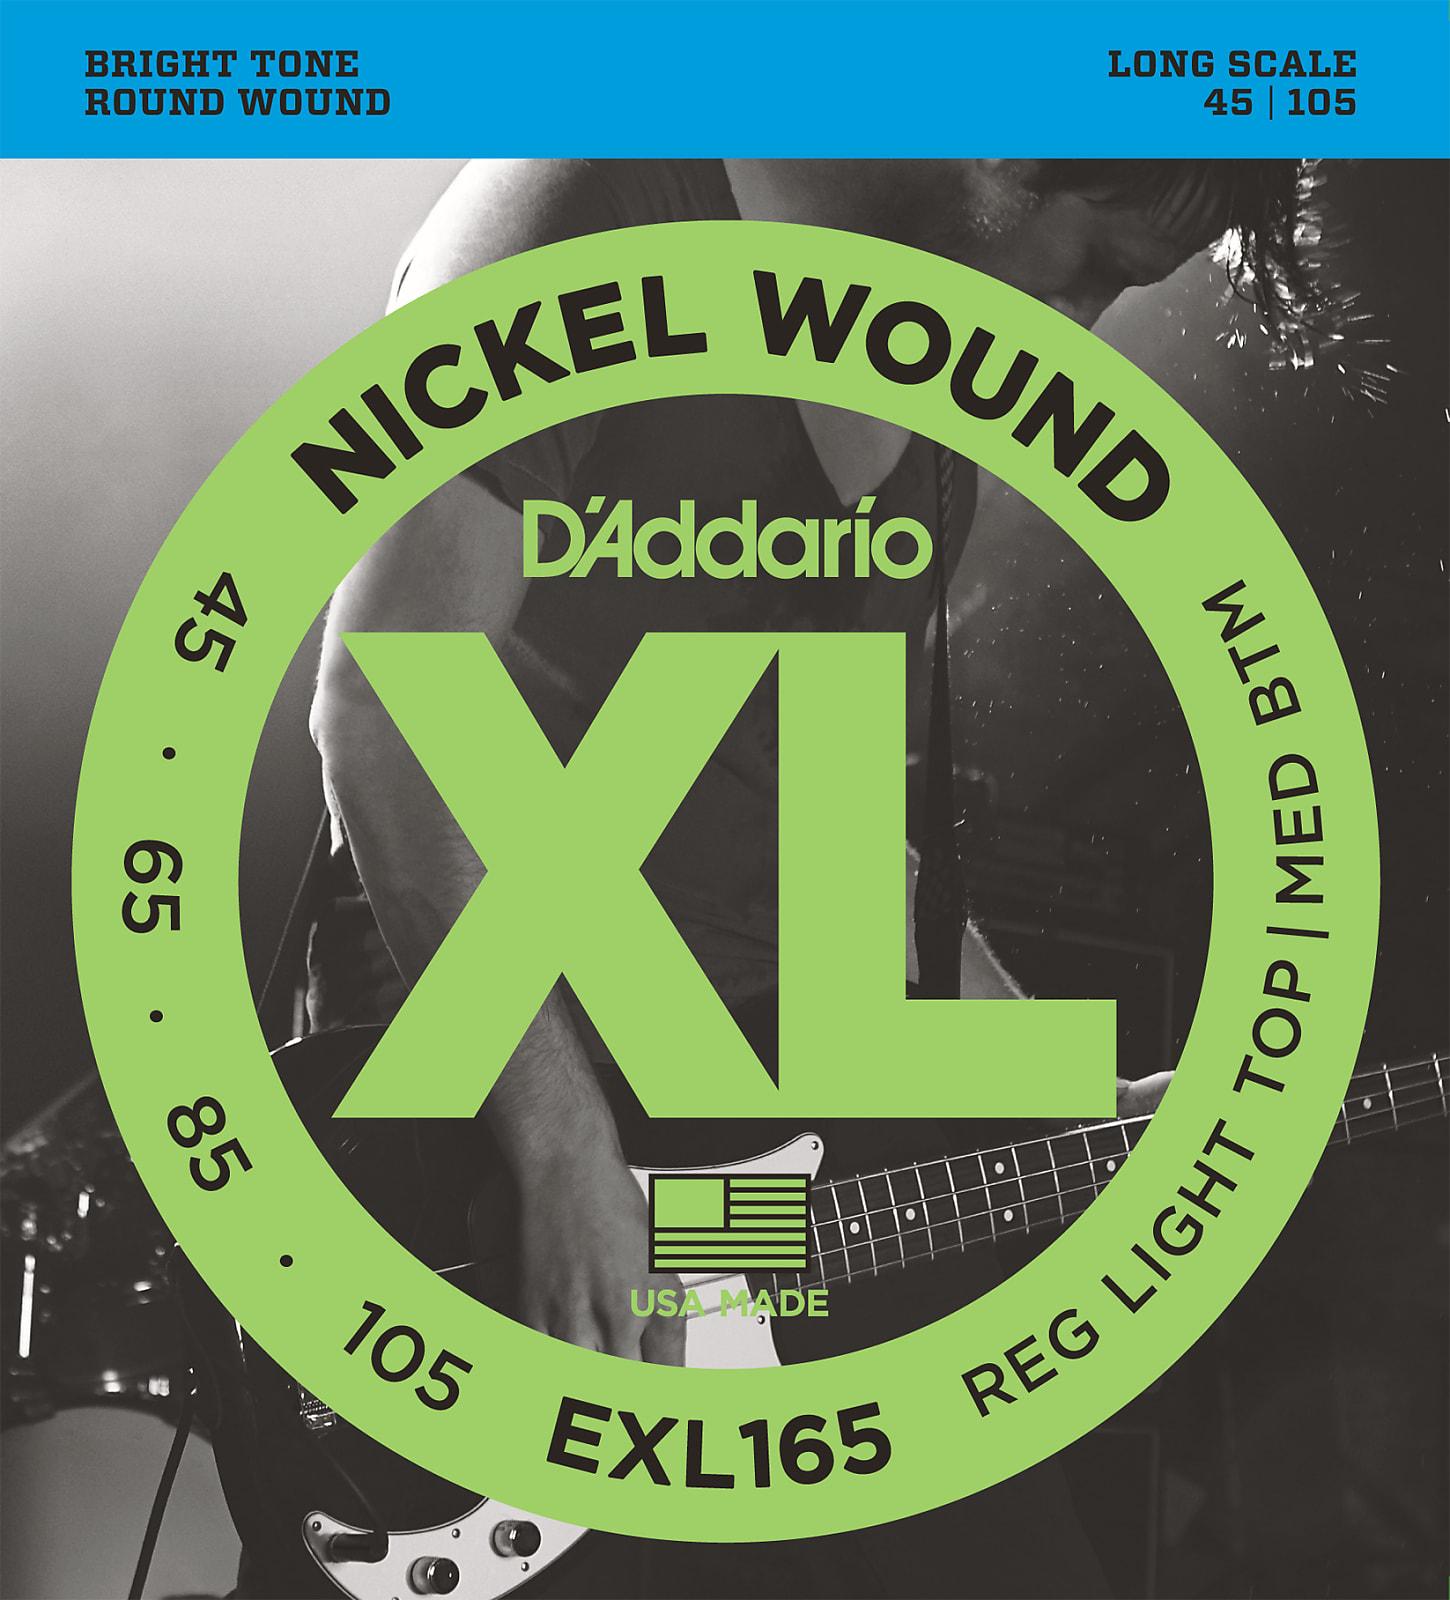 D'Addario EXL165 Nickel Wound Bass Guitar Strings, Custom Light, 45-105, Long S